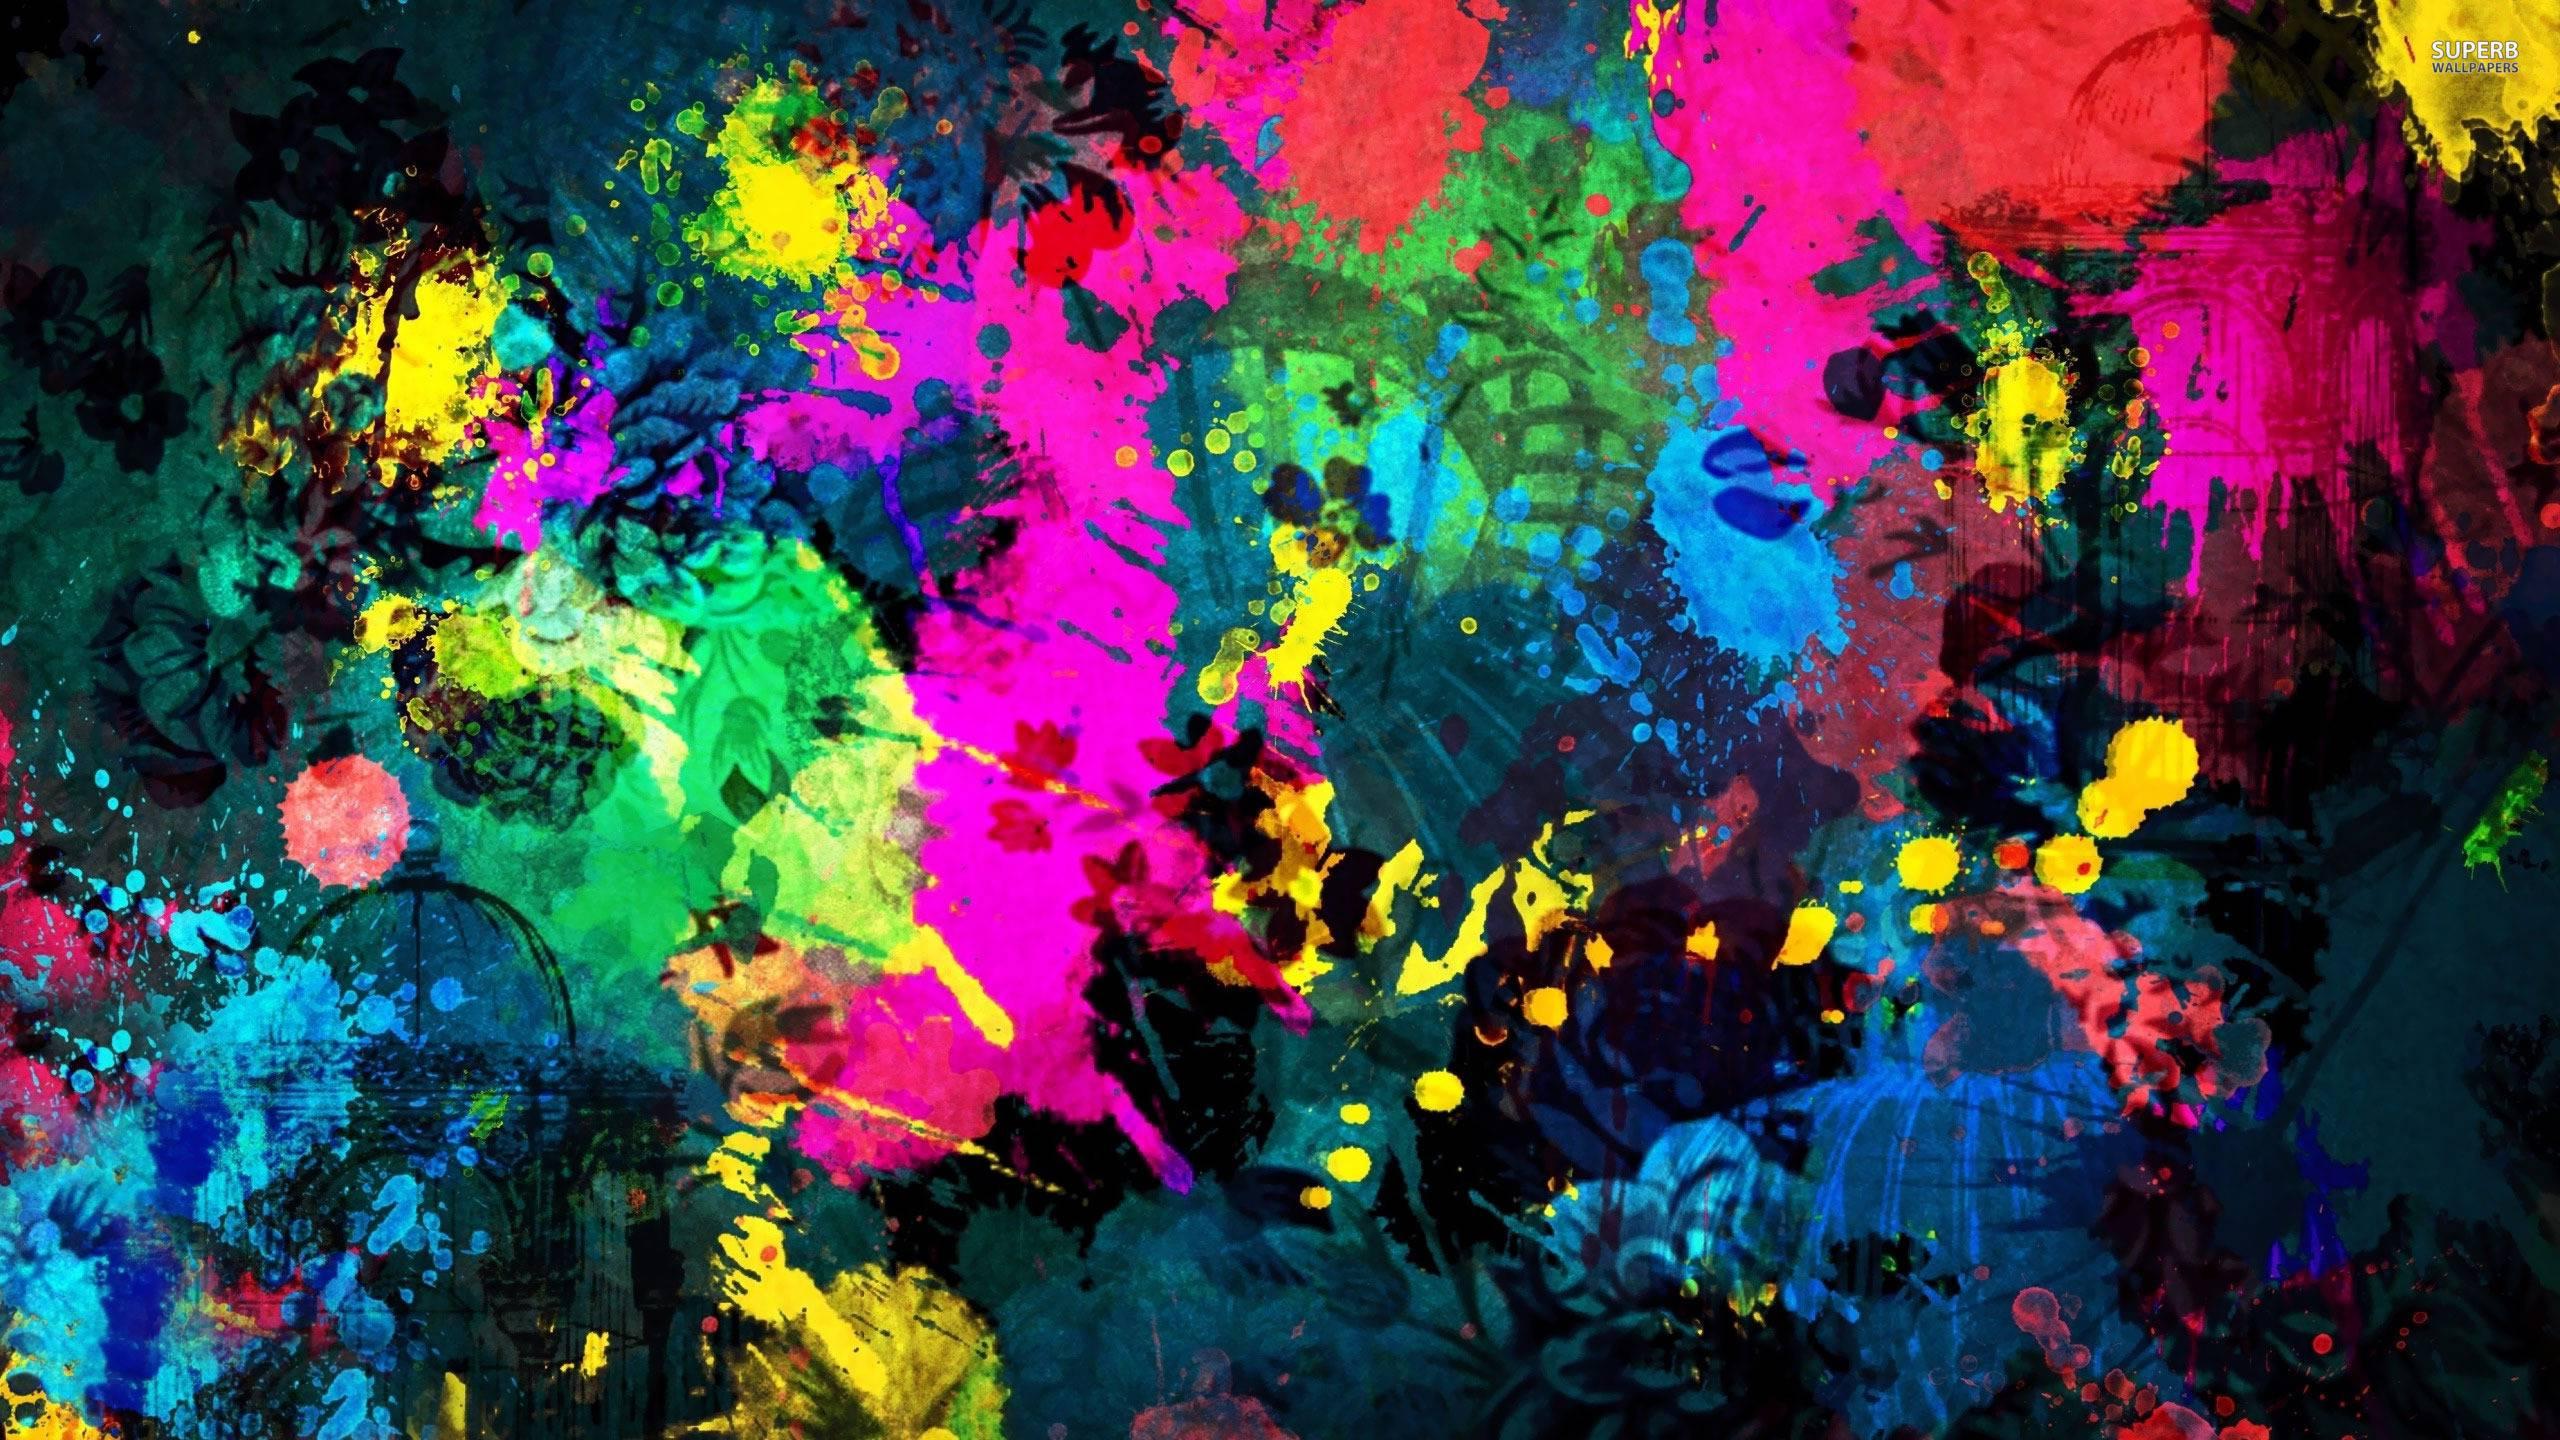 Paint Drop HD Wallpapers   Top Paint Drop HD Backgrounds 2560x1440